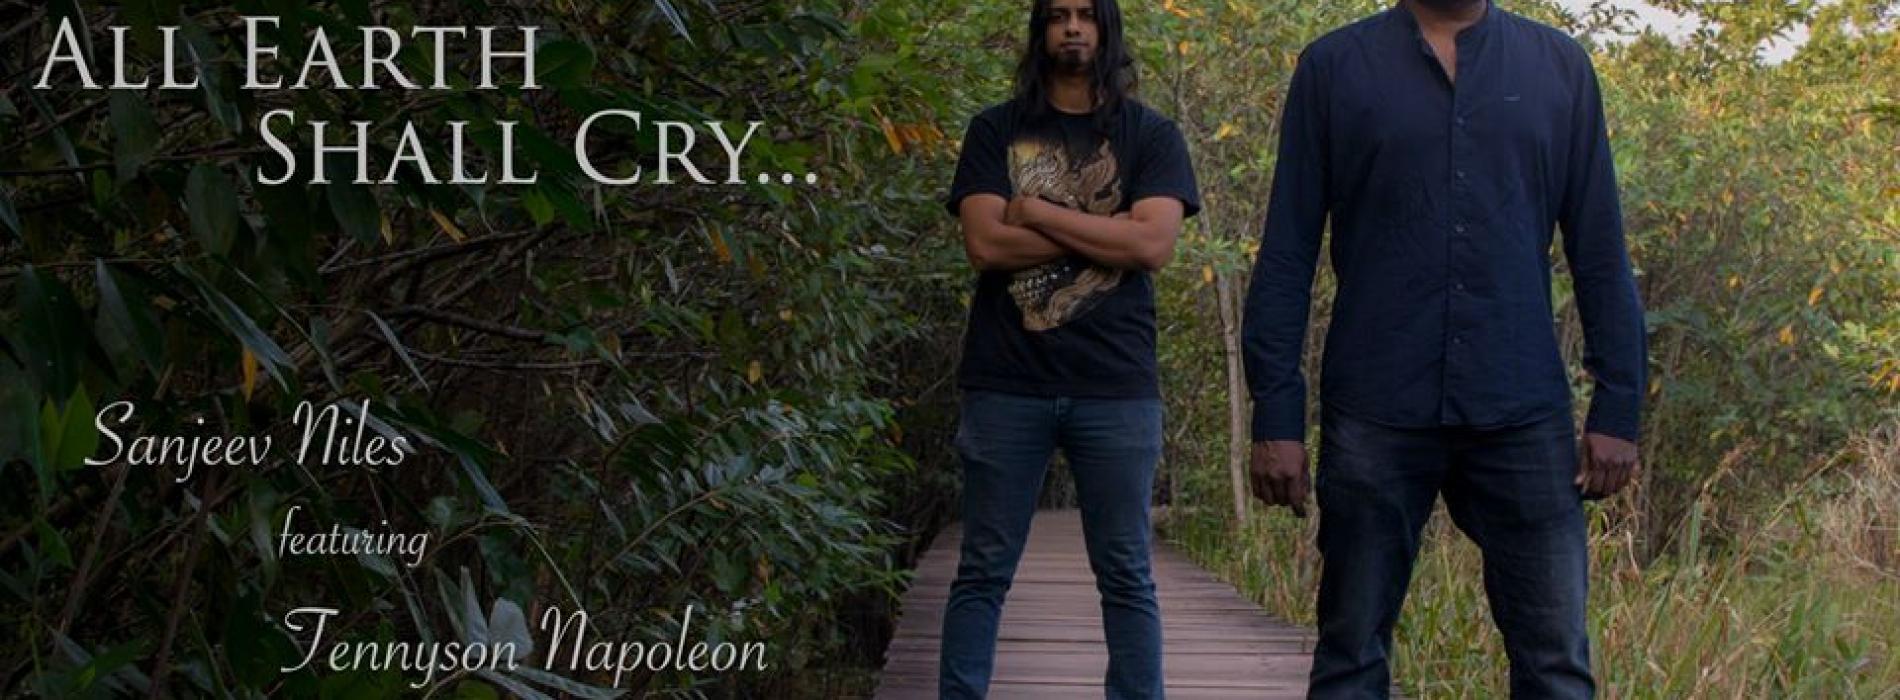 Sanjeev Niles Announces New Music!